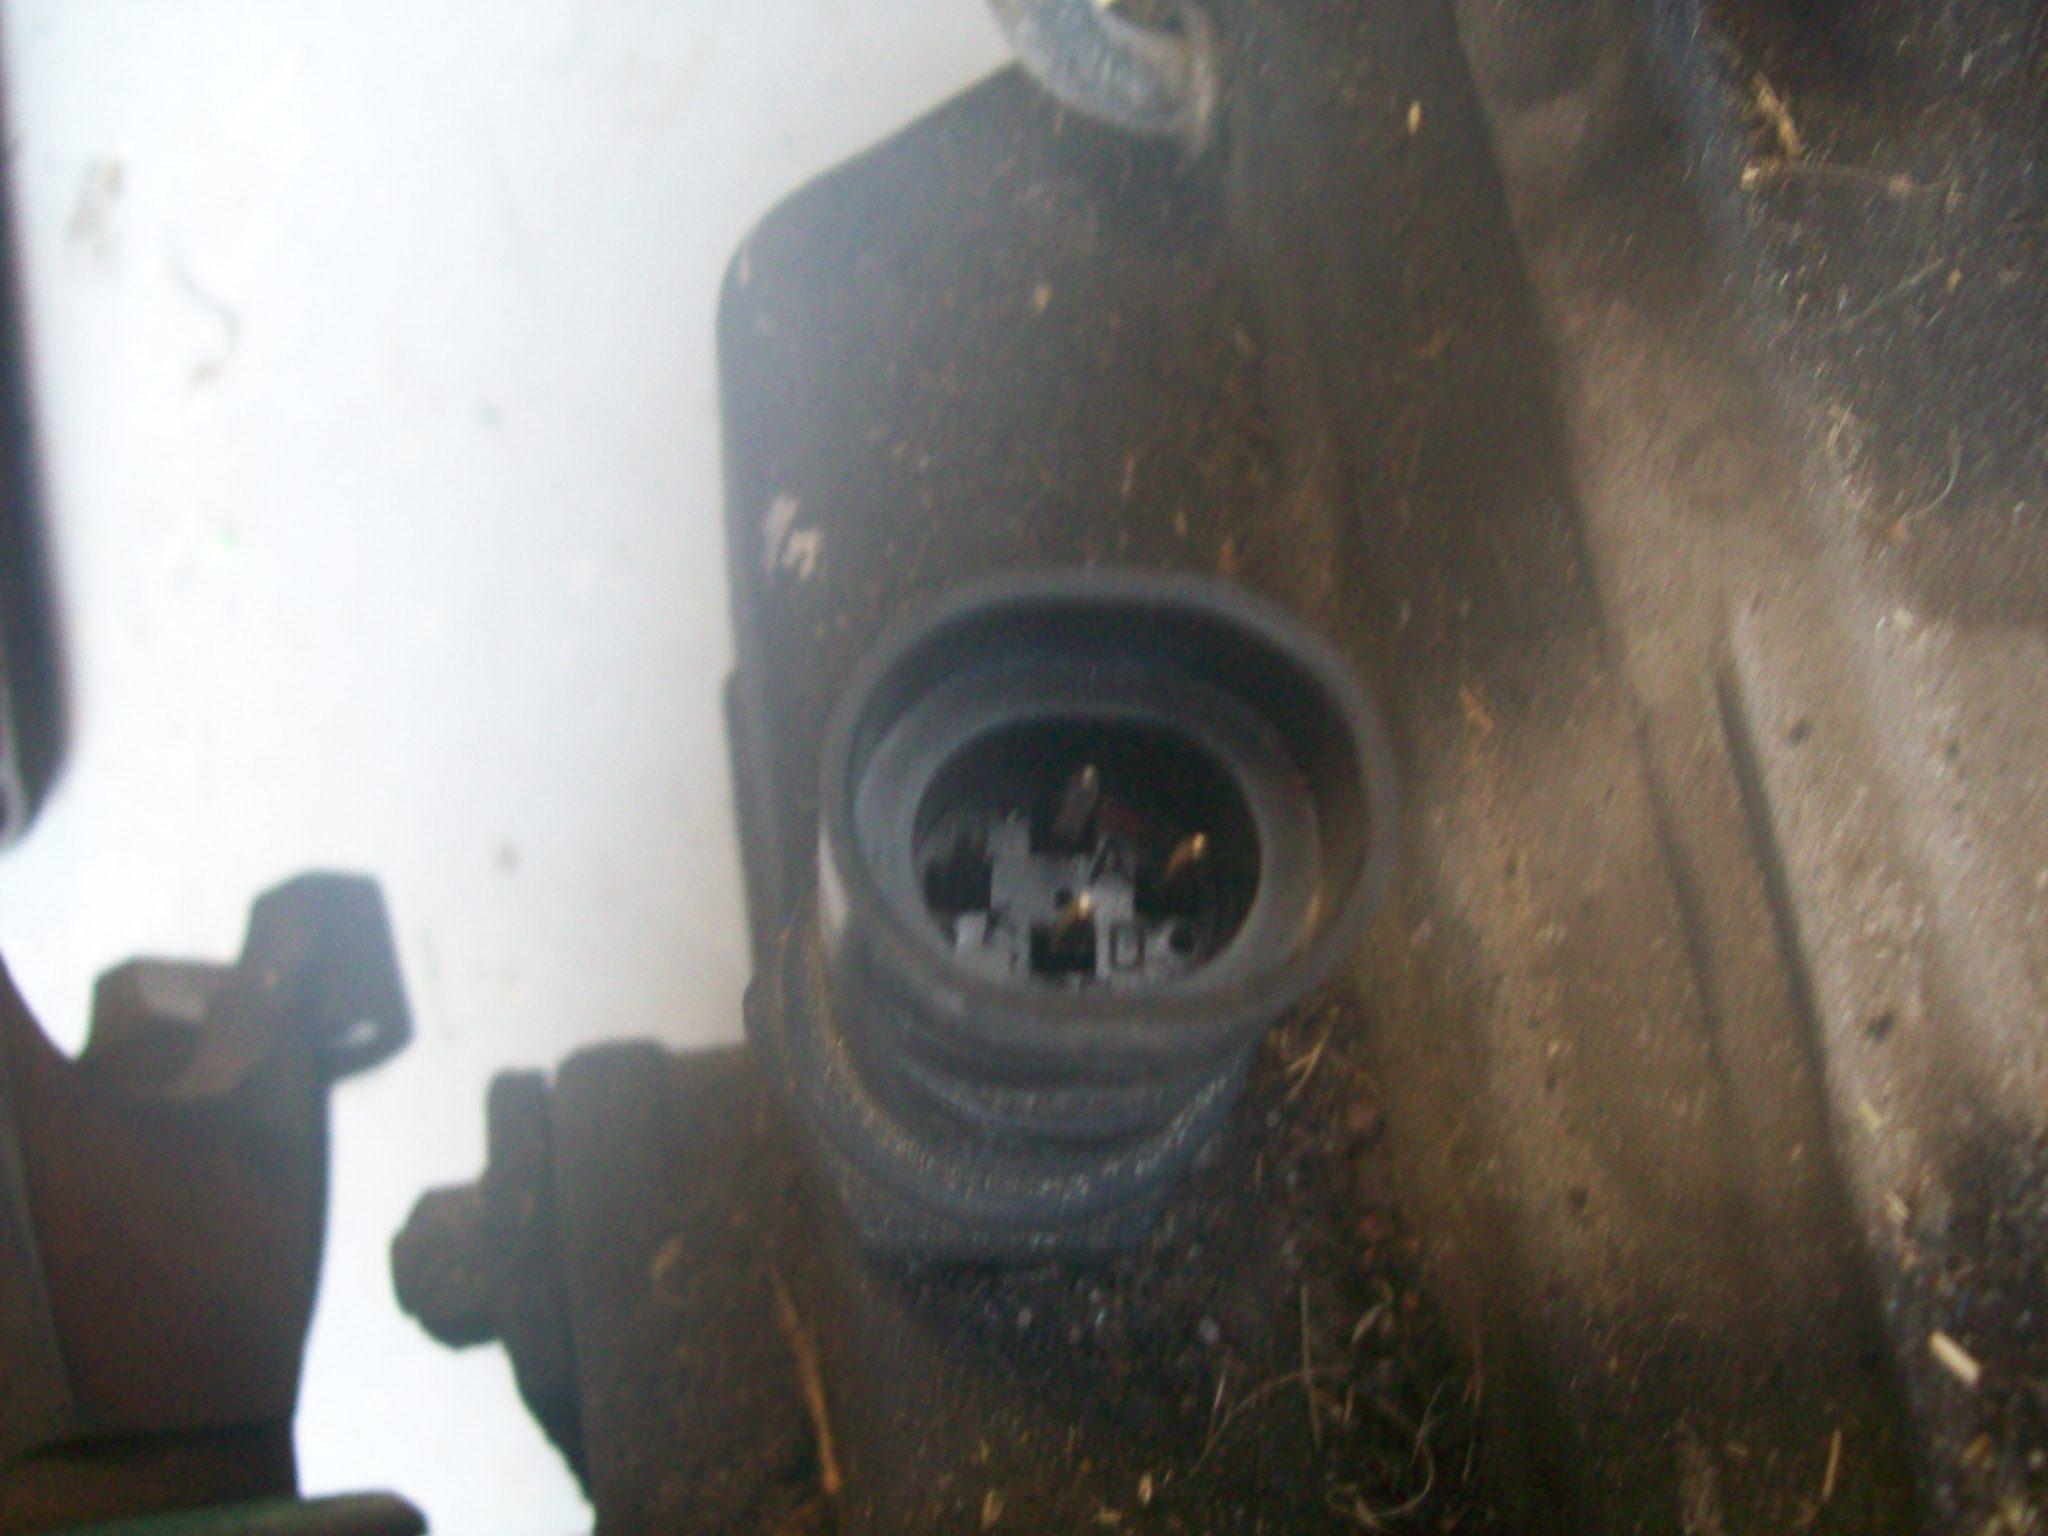 jeep-parts-003.jpg